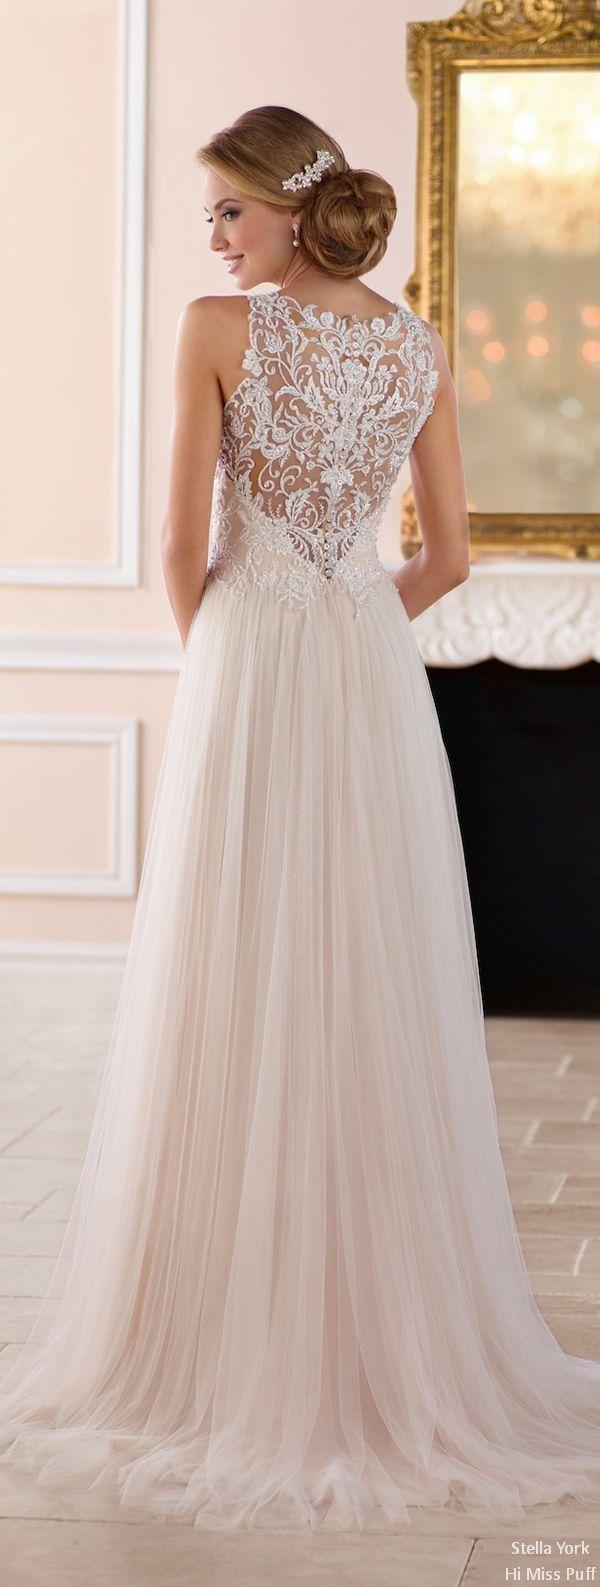 386631bc614b711362f86a9b85926773--elegant-wedding-dresses--wedding-dresses